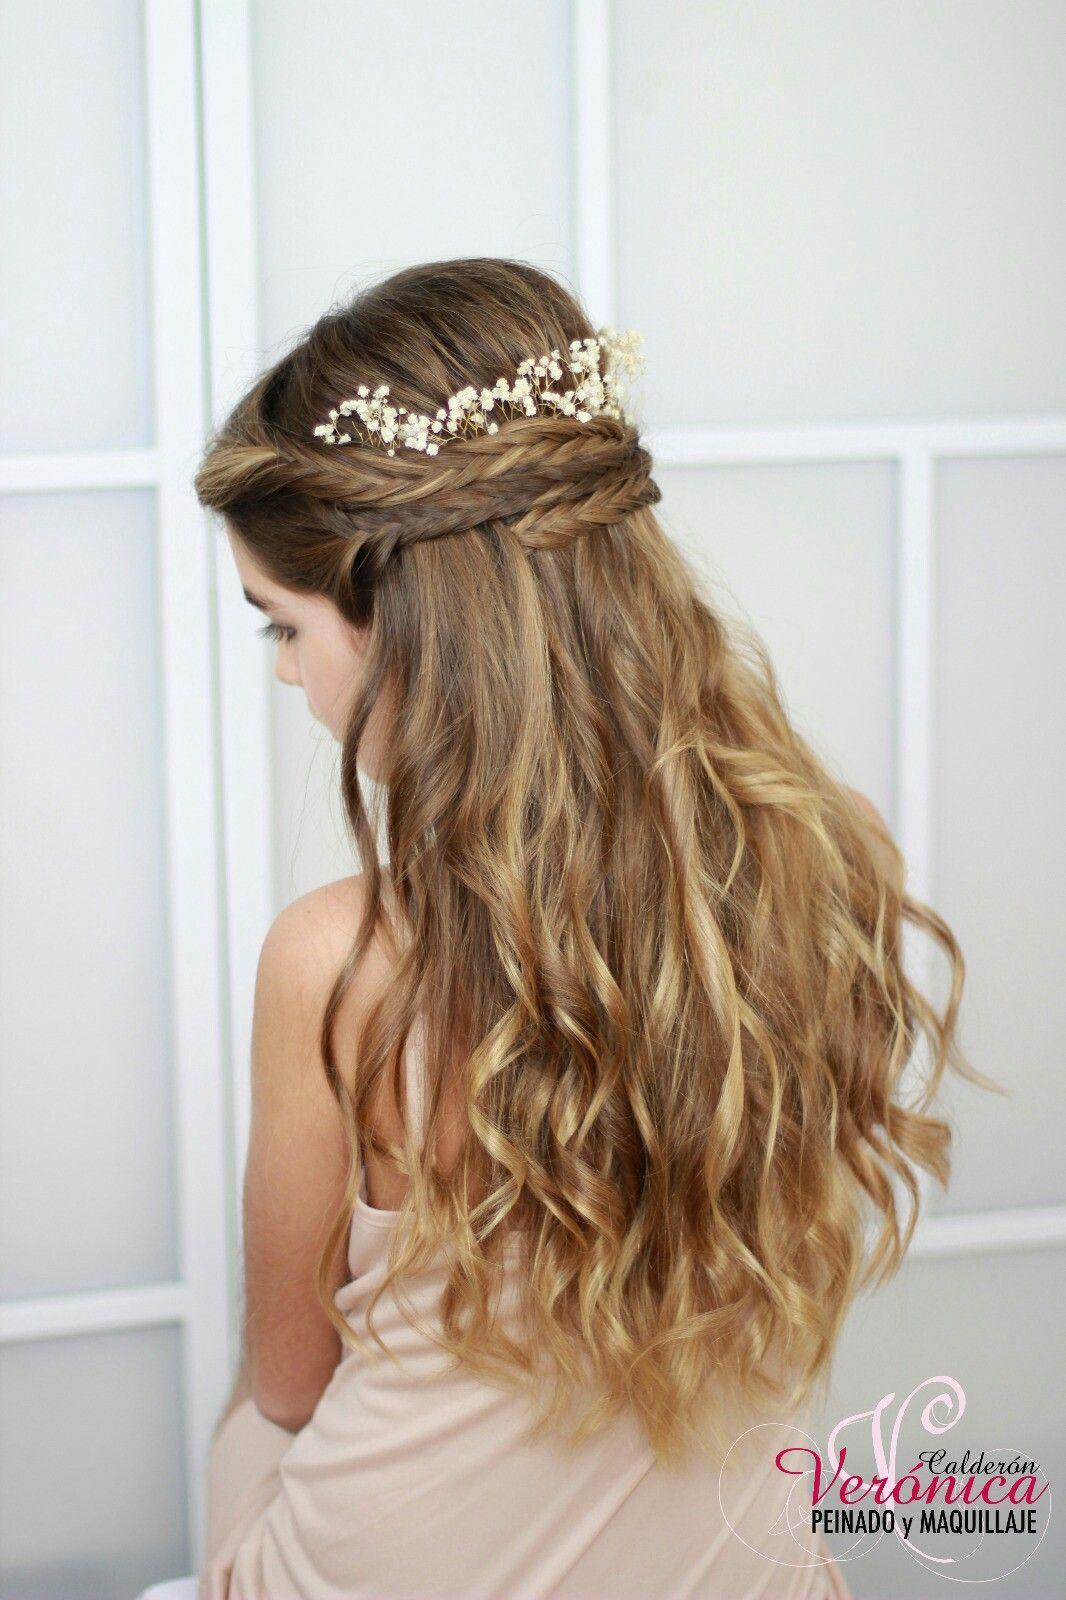 Ideas de estilo para peinados novia media melena Fotos de consejos de color de pelo - Preciosa melena de ondas duaves y detalle de trenzas de ...